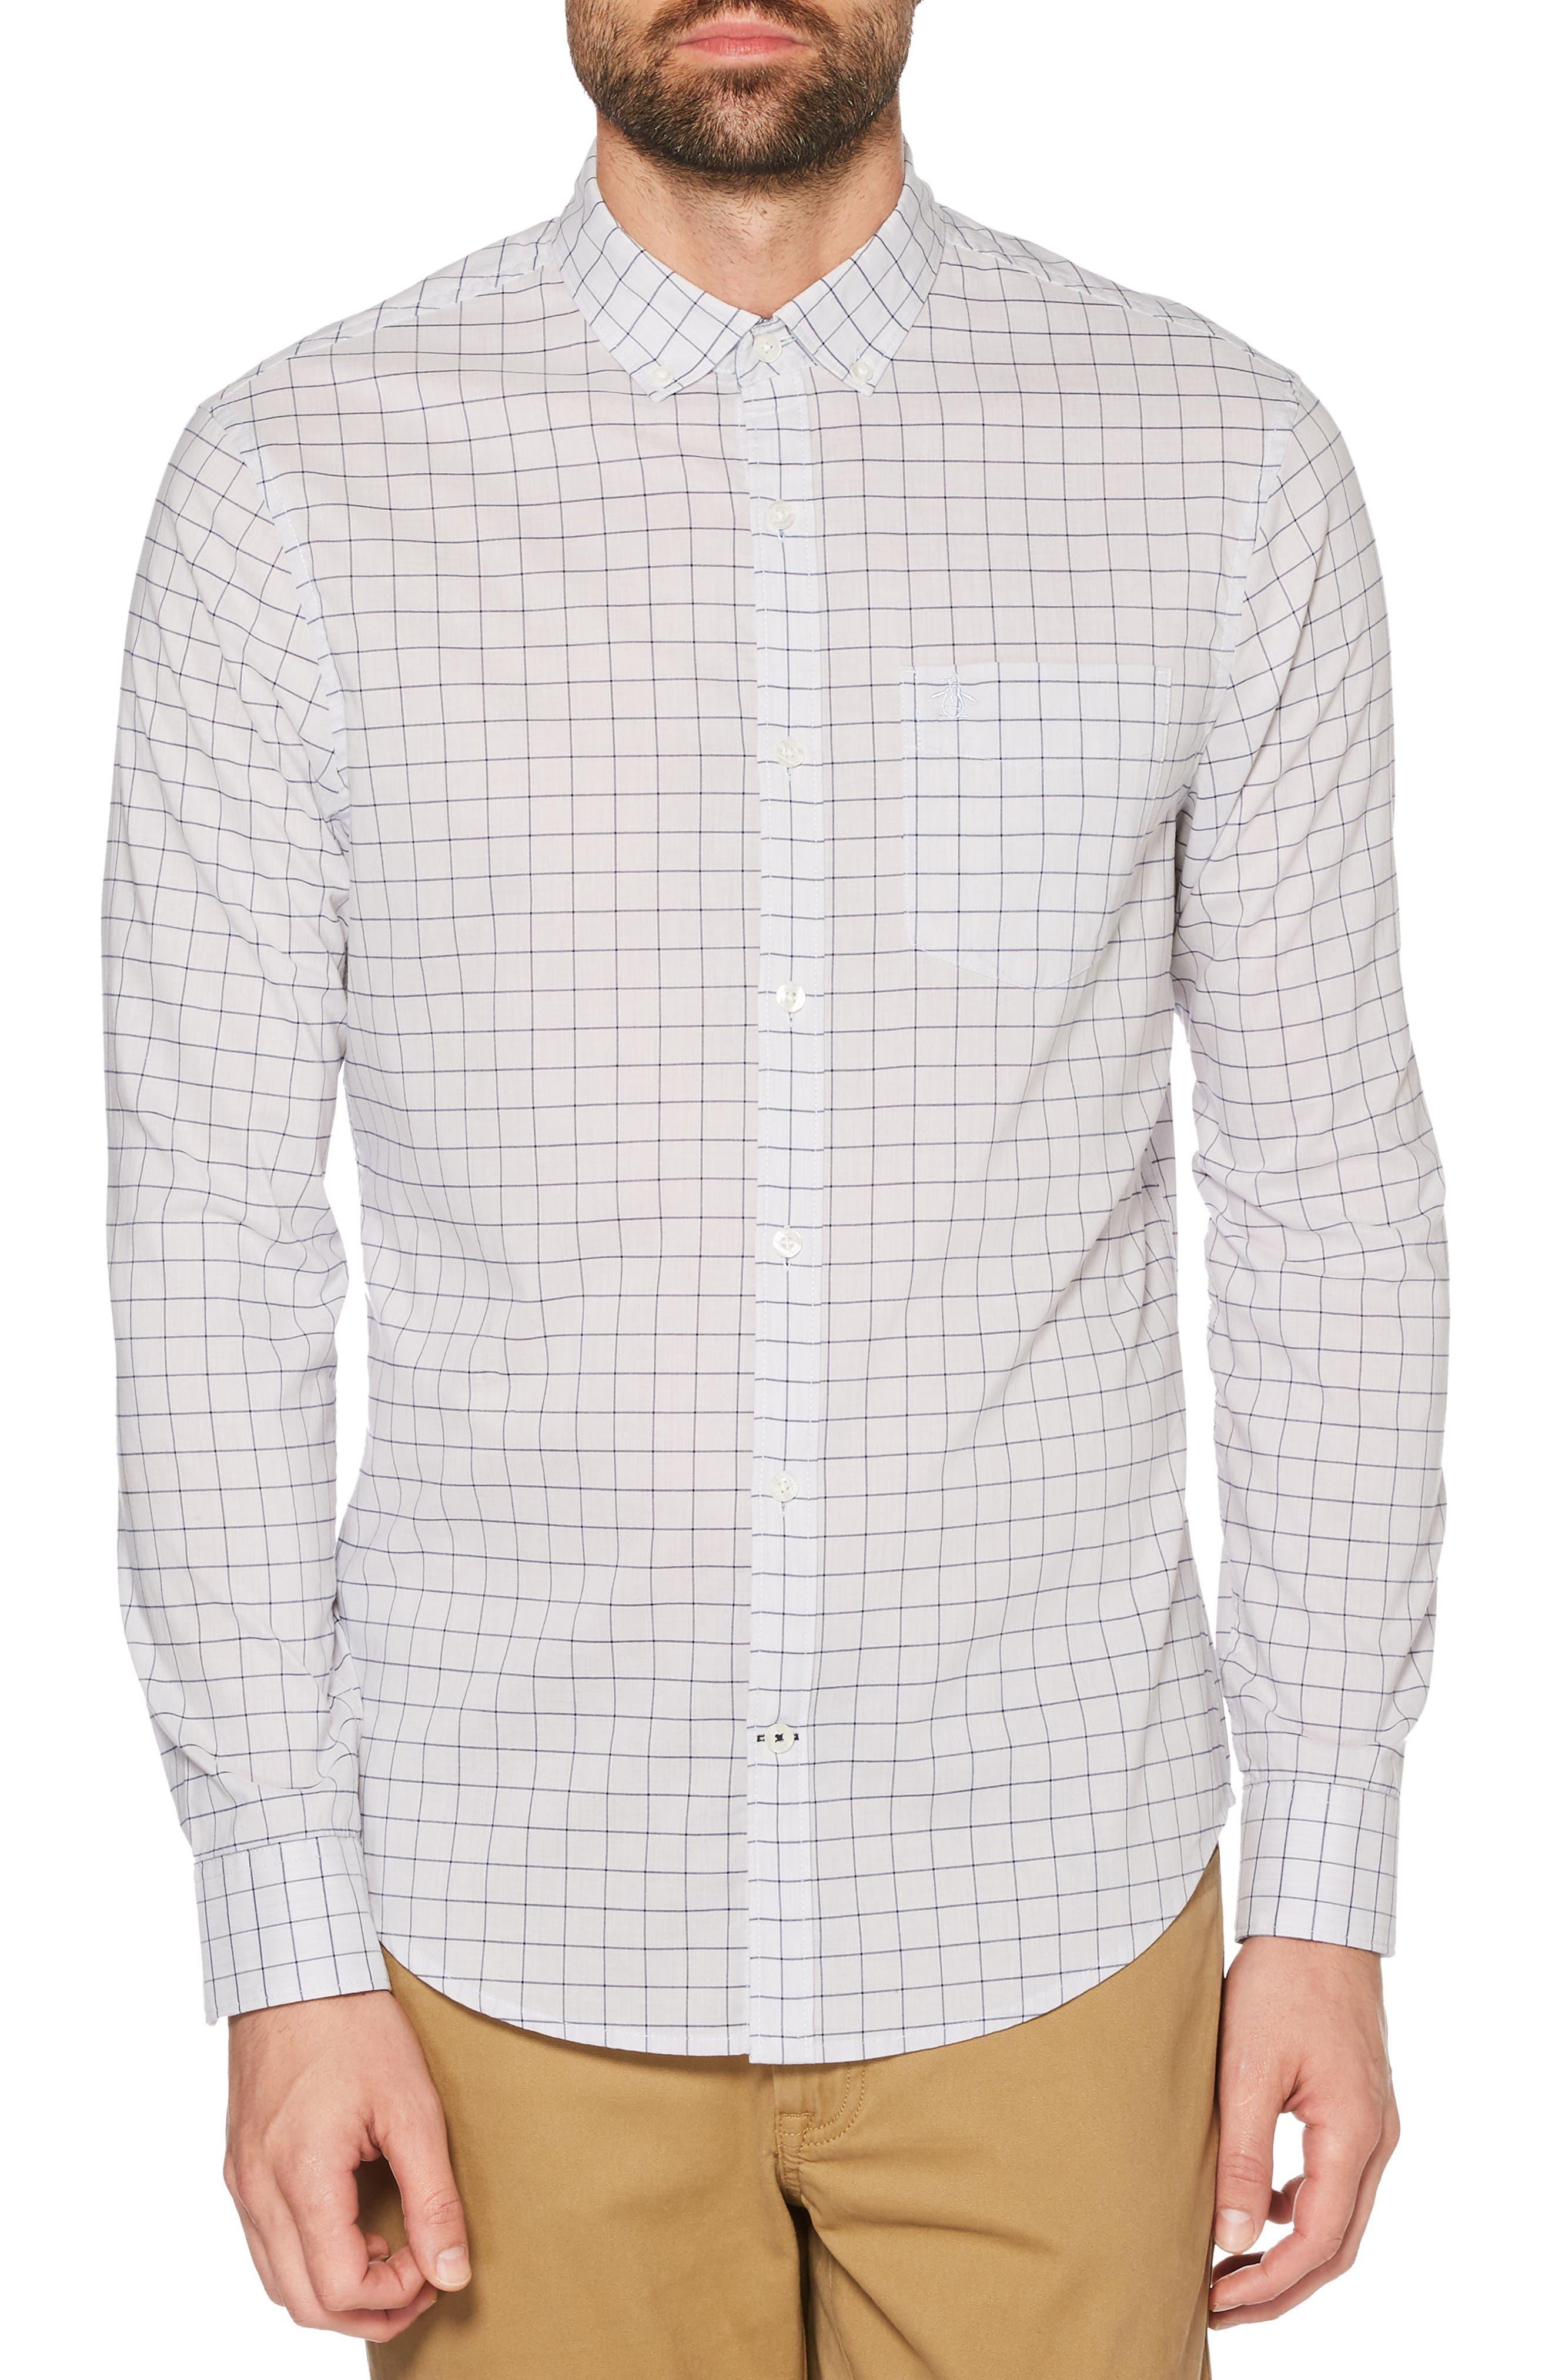 P55 Slim Fit Shirt,                         Main,                         color, 427